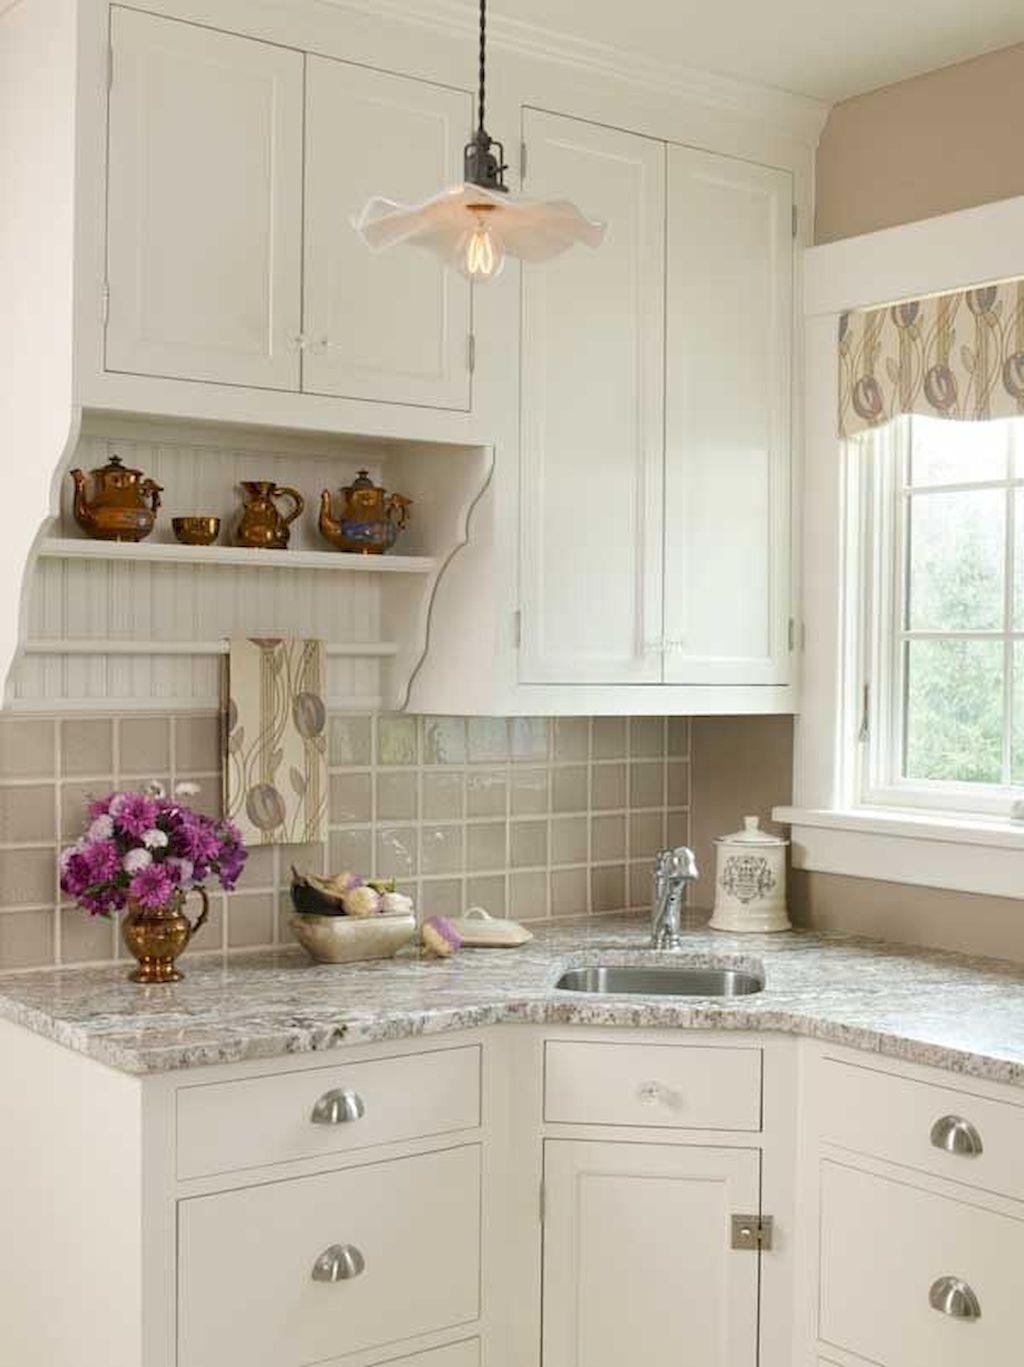 Kitchen sink window decor  choose best color for small kitchen remodel  kitchen designs